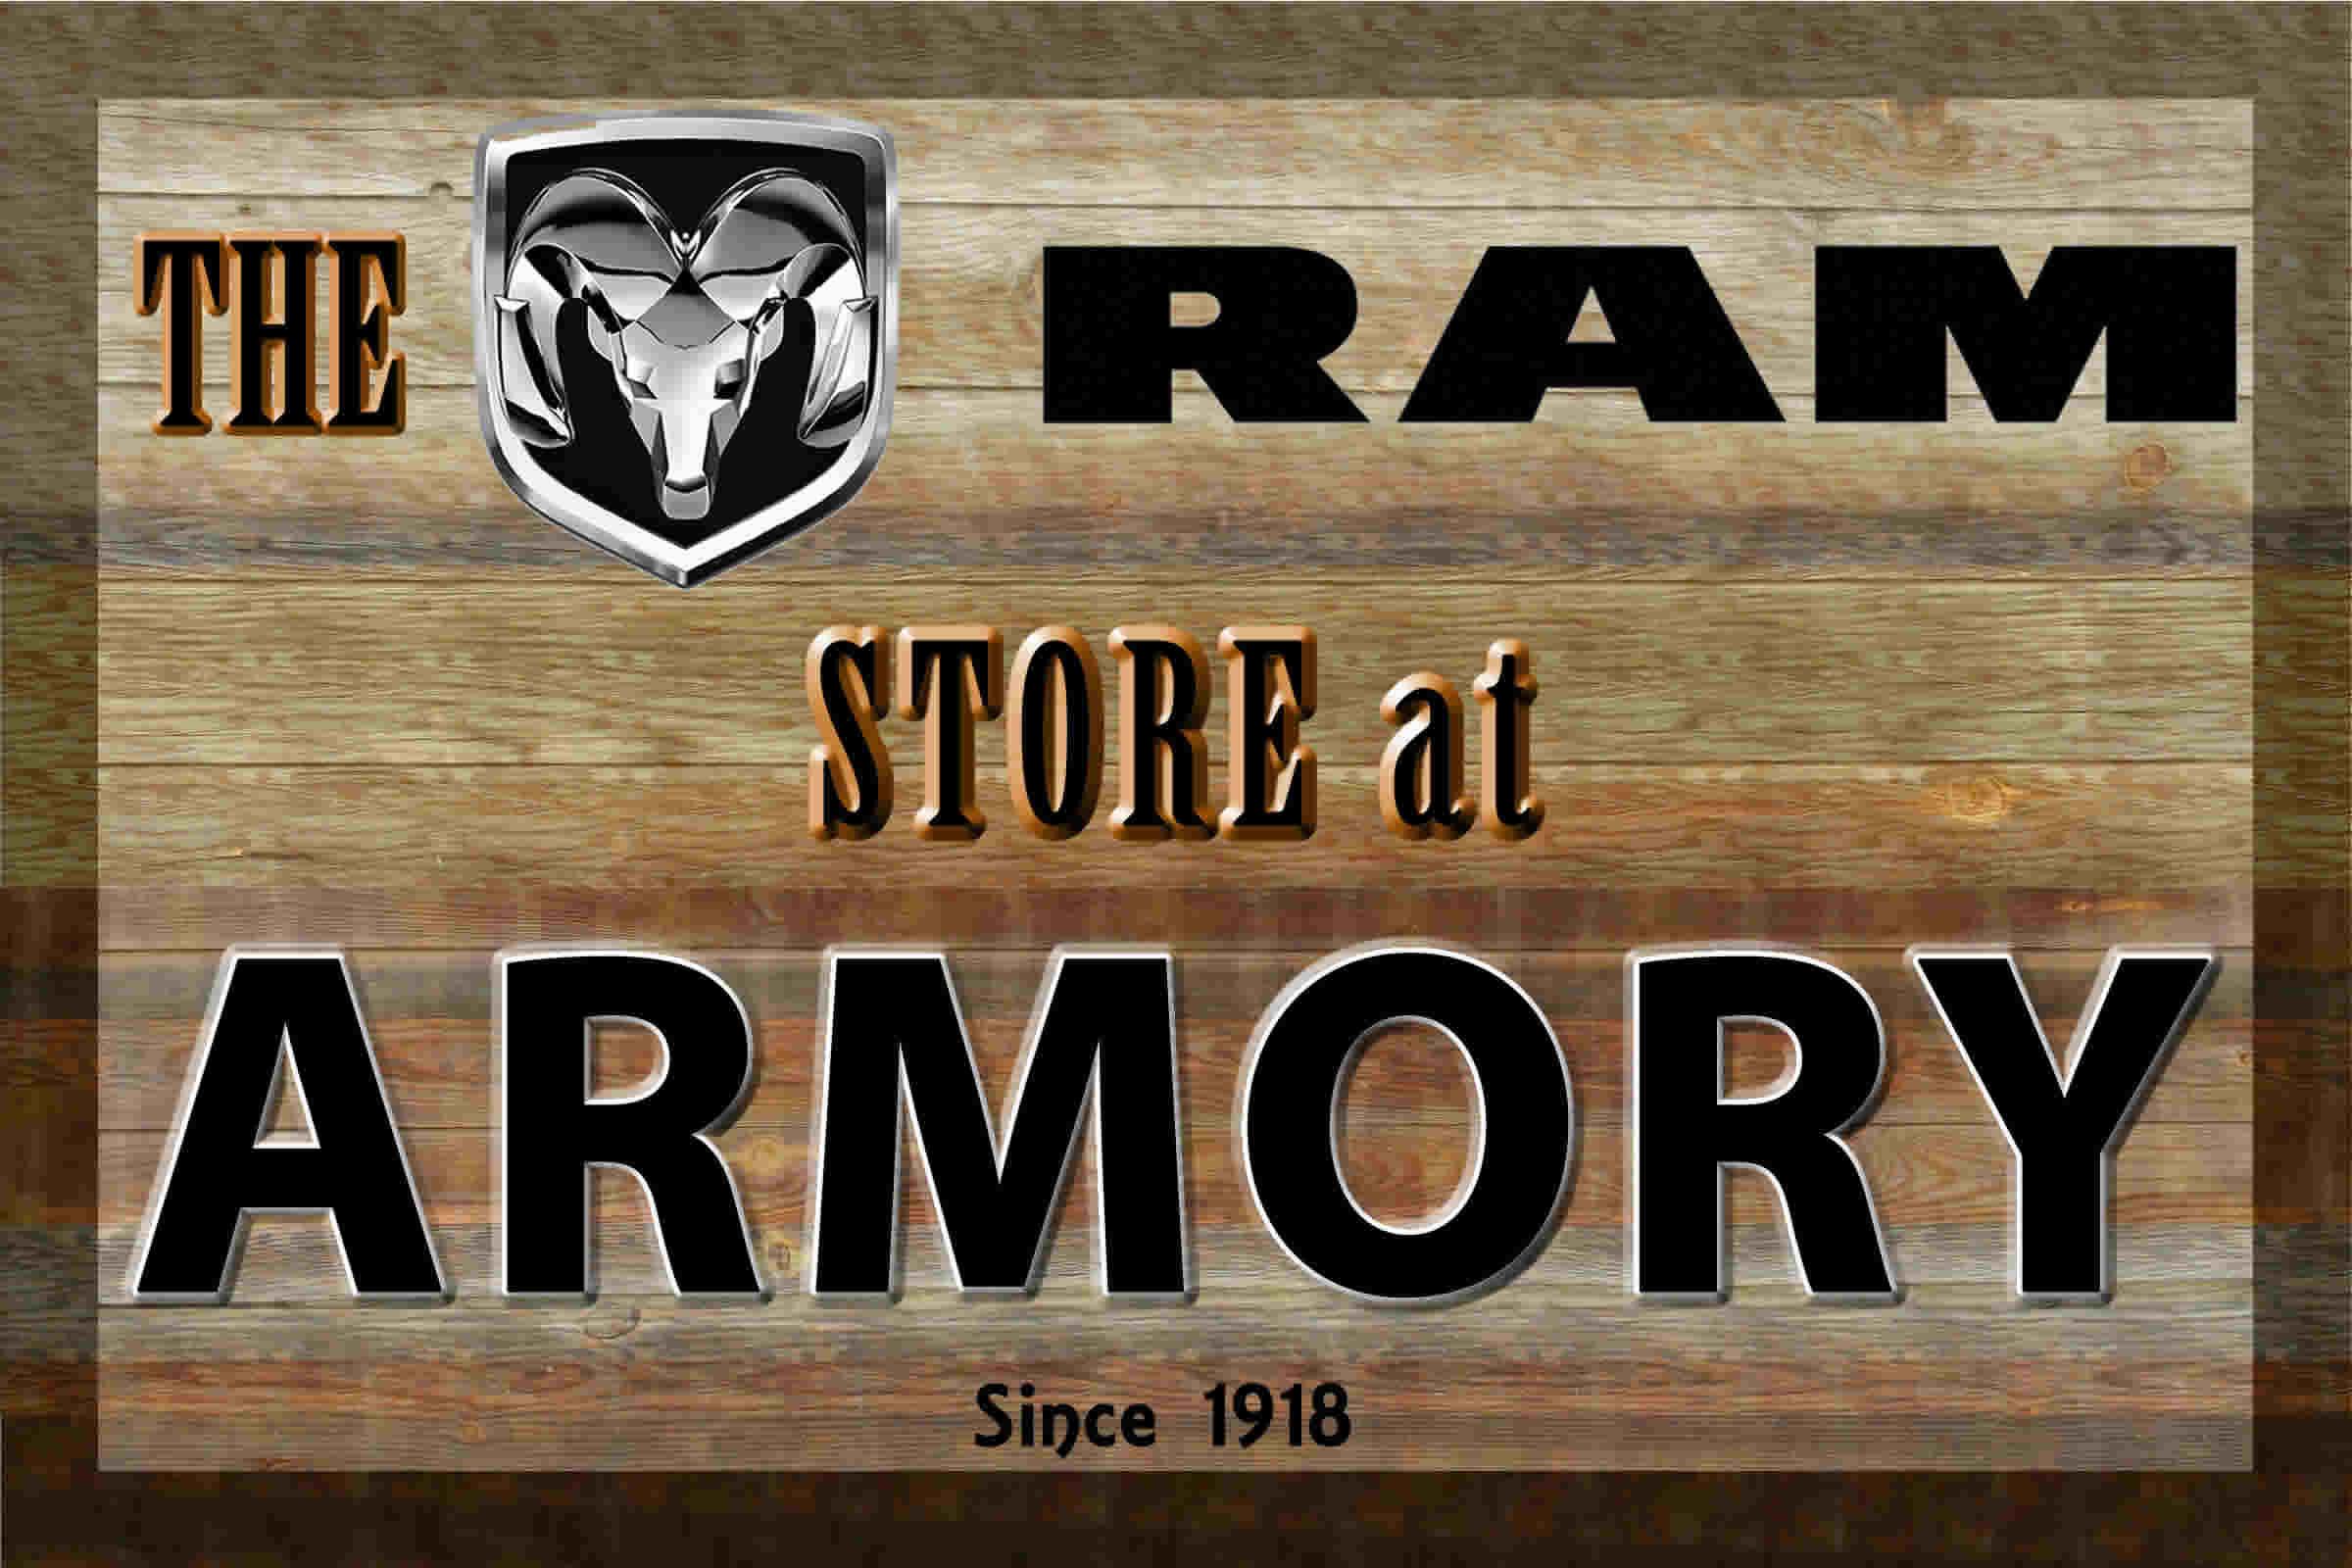 Armory Automotive